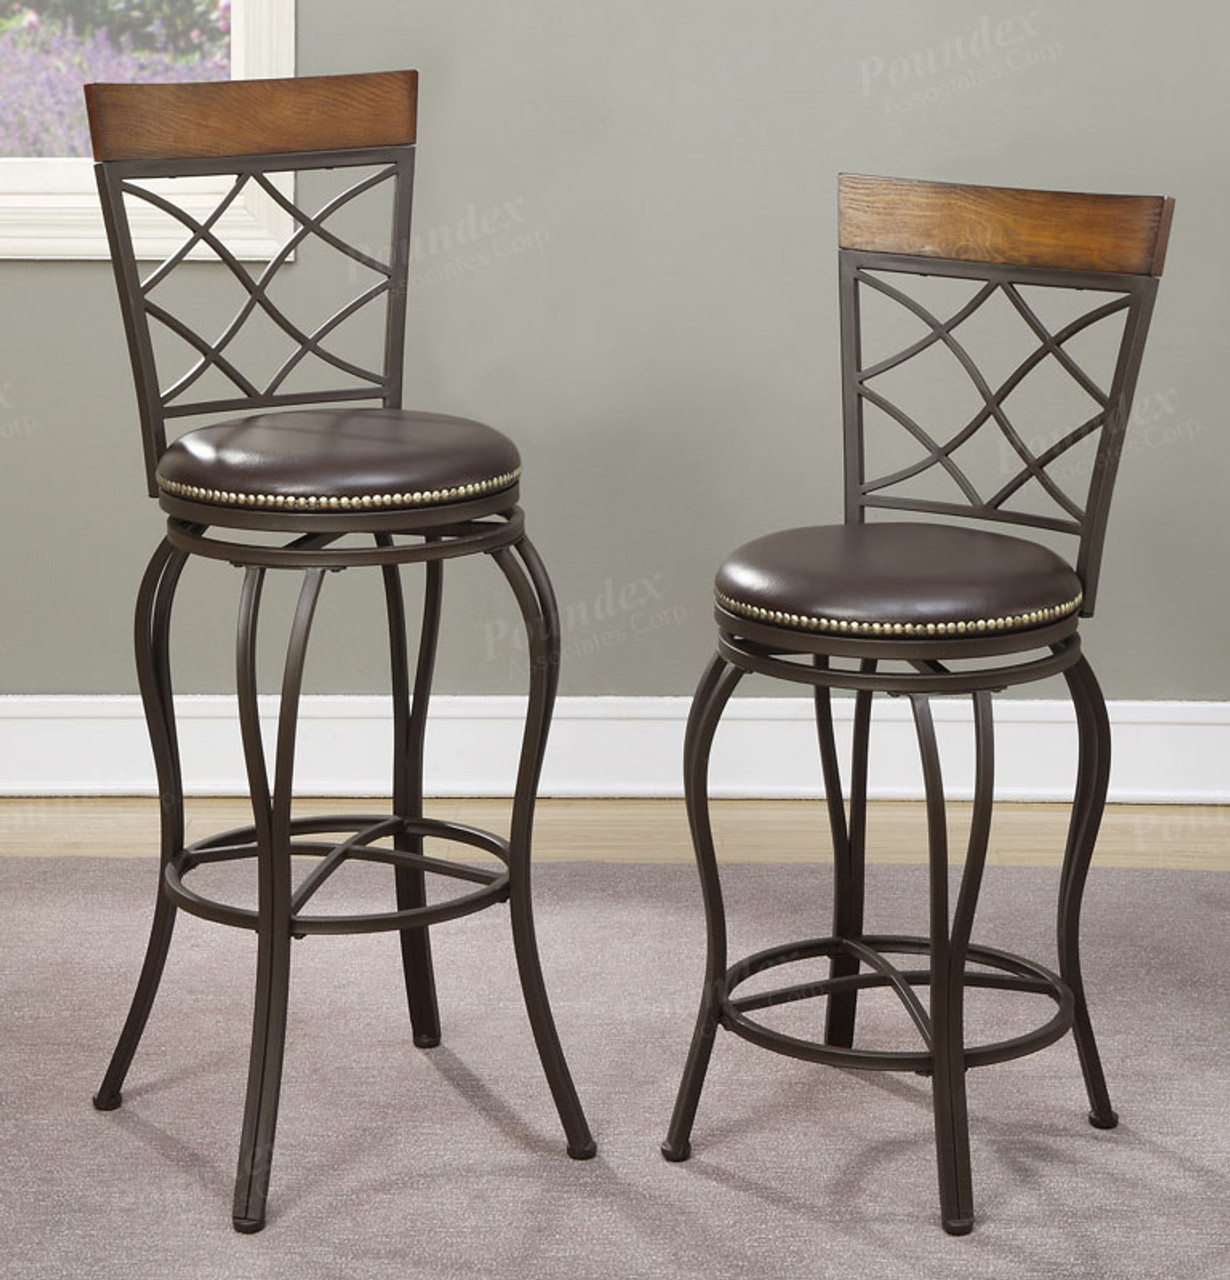 Poundex F1417 Swivel Metal Chairs W Leatherette Seat